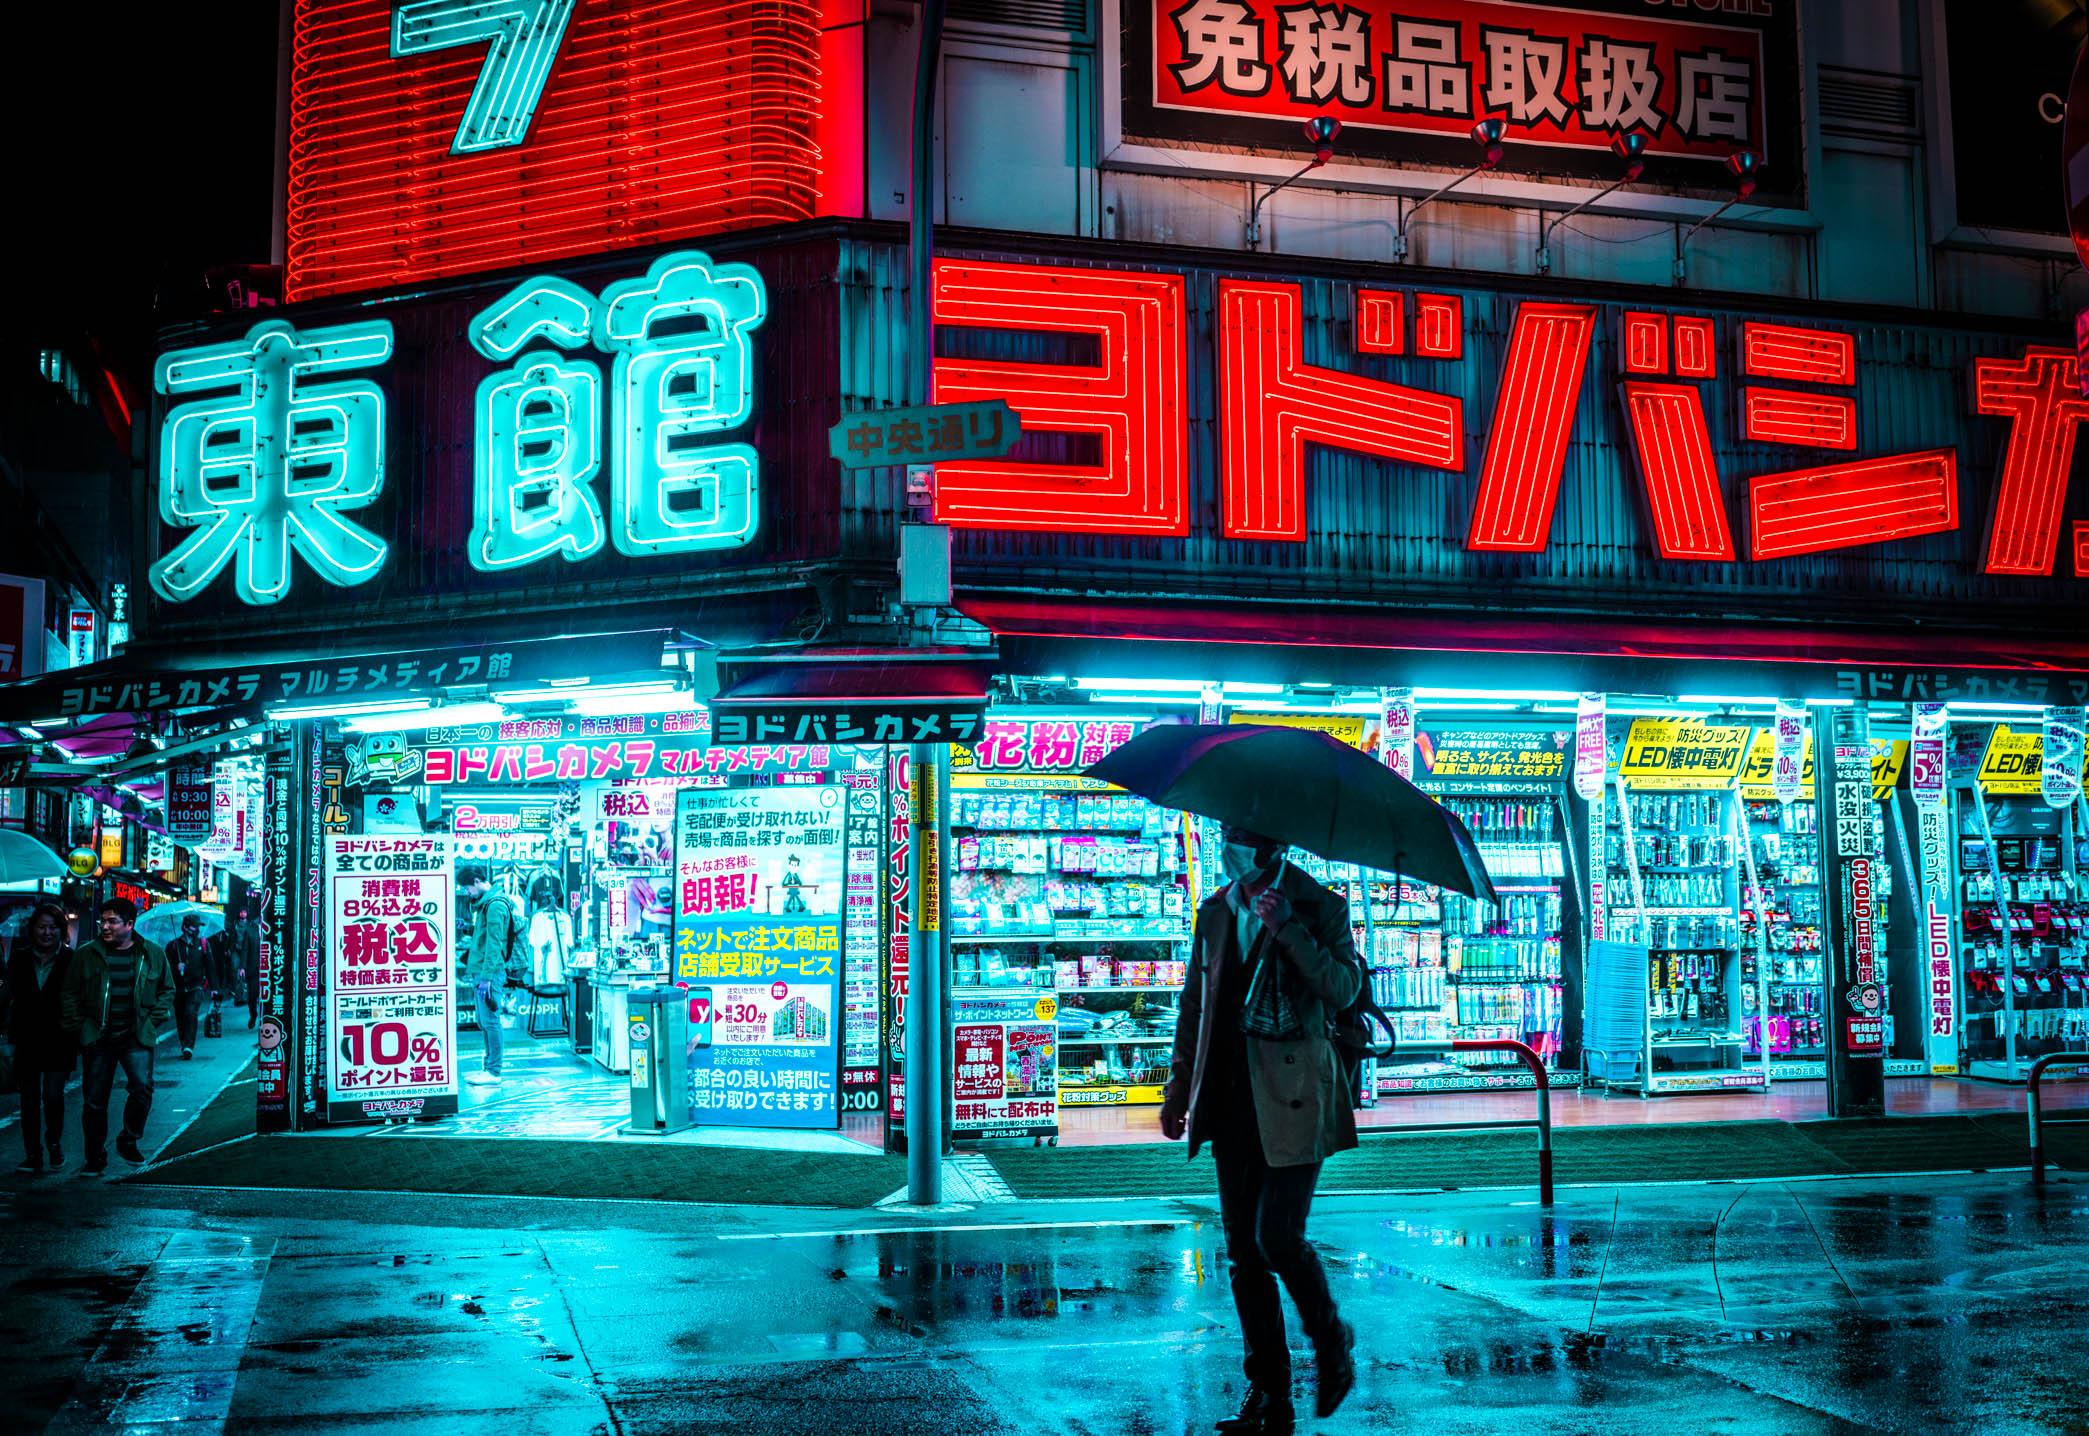 General 2089x1436 Tokyo Japan rain cyan red neon glow neon city lights wet street bright umbrella teemusphoto